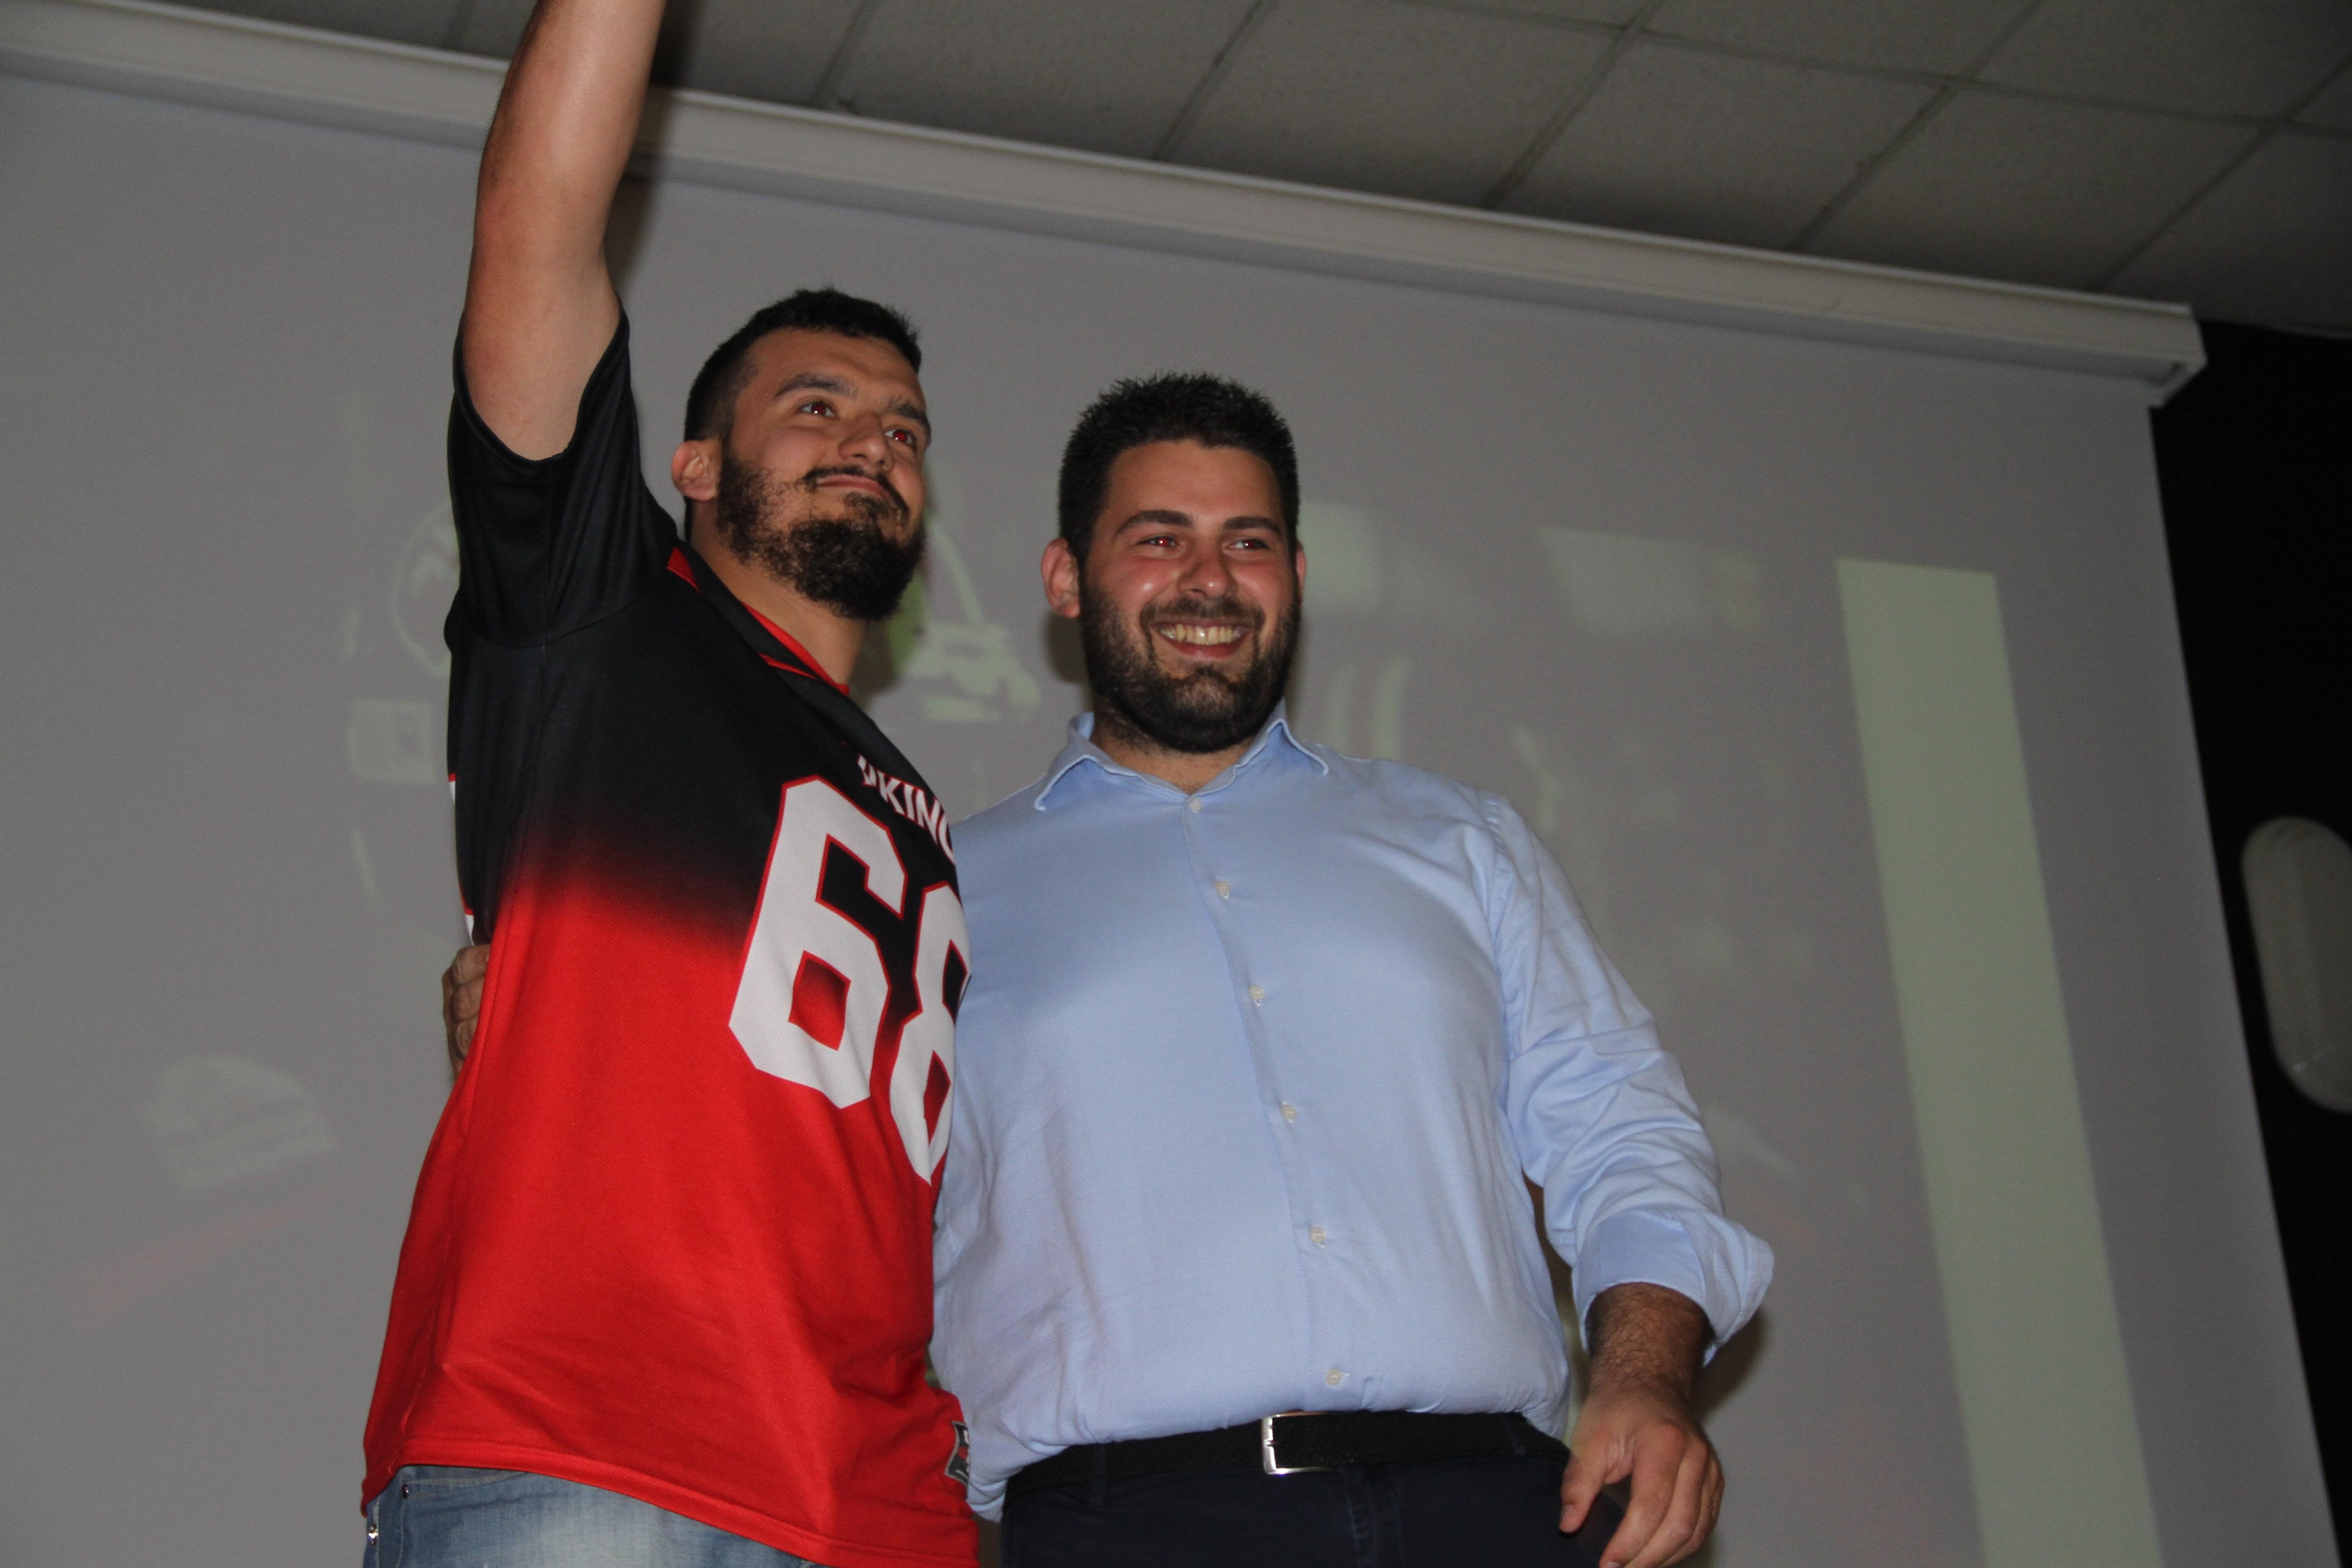 MVP Offense 2019 Lorenzo Chiavazza